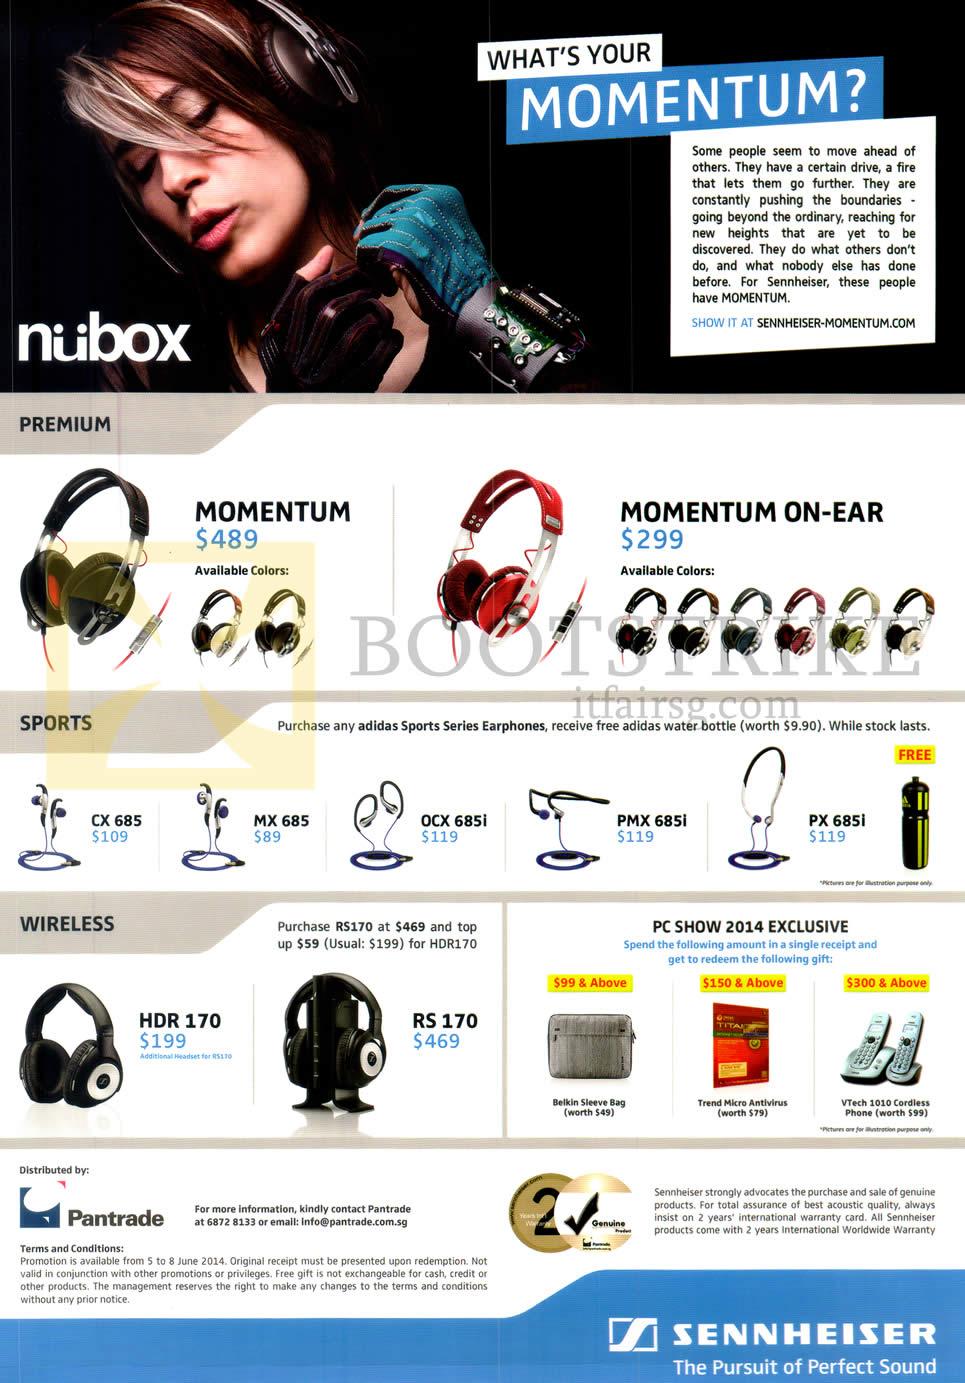 PC SHOW 2014 price list image brochure of Nubox Sennheiser Headphones, Earphones, Momentum, CX685, MX685, OCX-685i, PMX685i, PX685i, HDR 170, RS 170